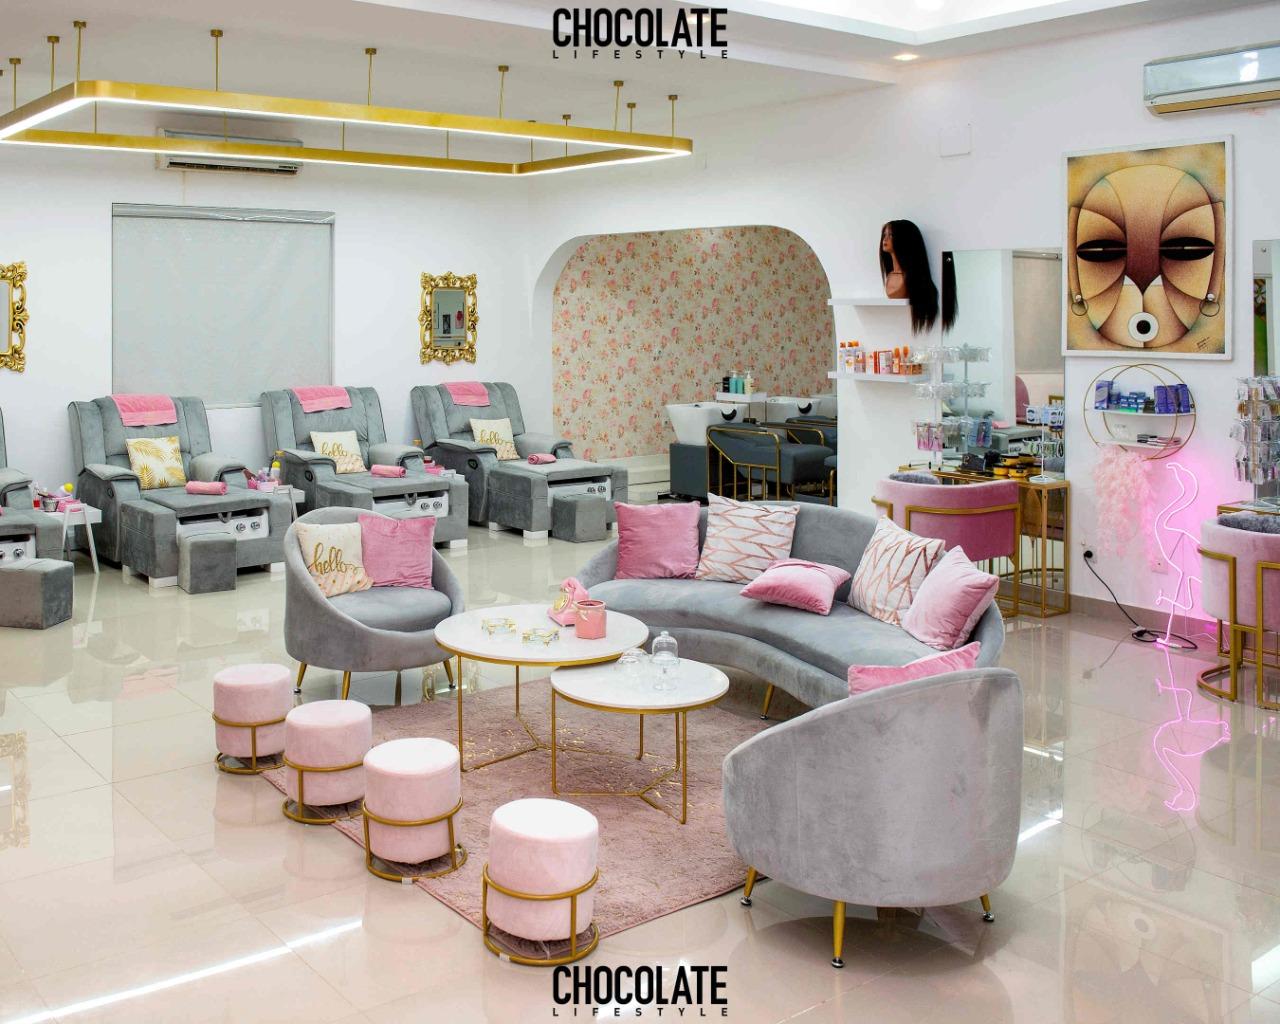 Spa VIP Beauty Lounge abre em grande estilo